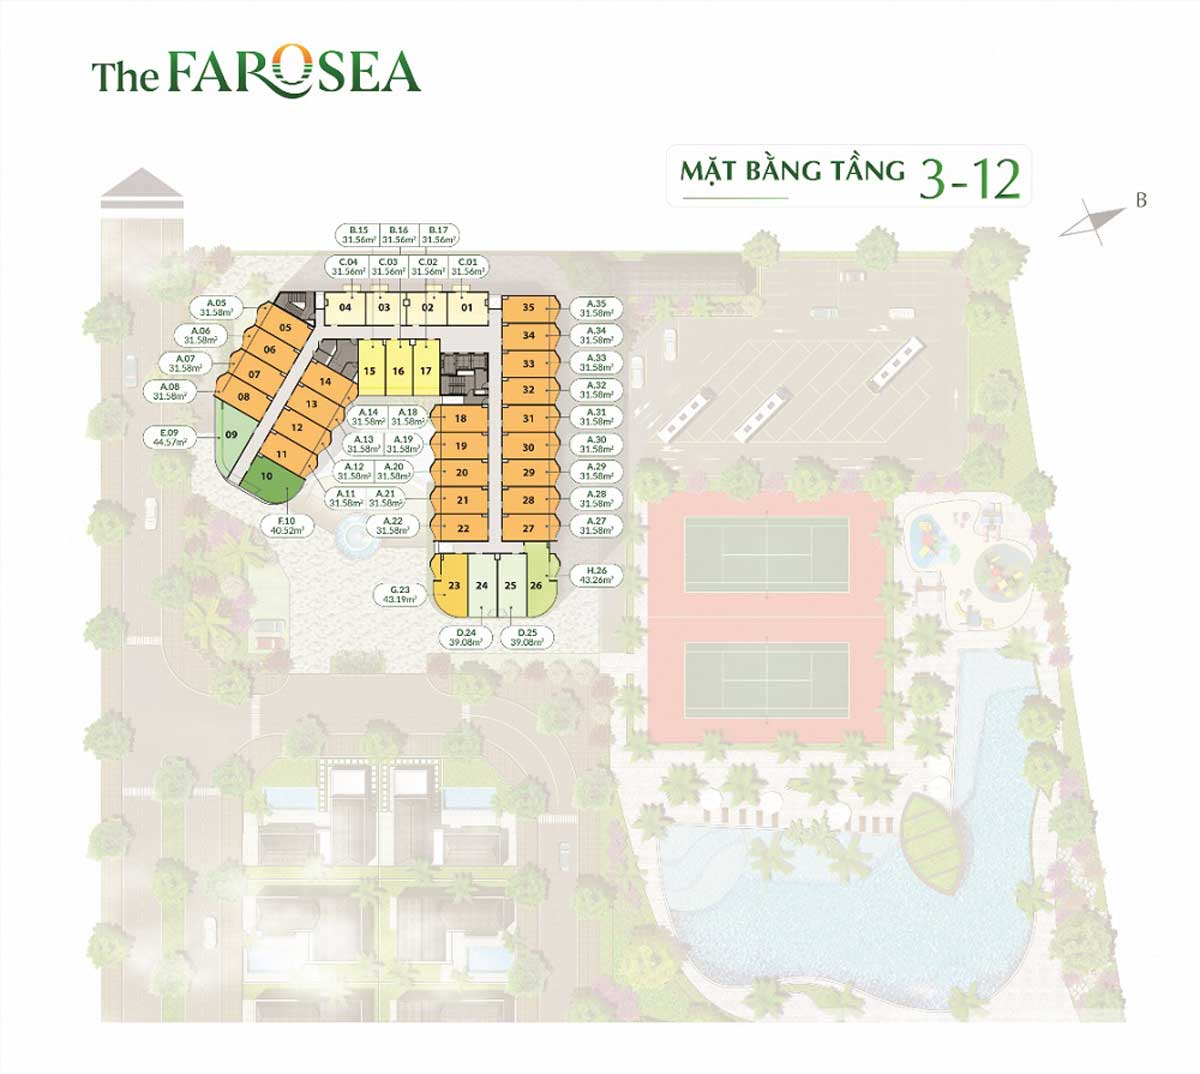 mat bagn tang 3 12 du an can ho the farosea - THE FAROSEA PHAN THIẾT